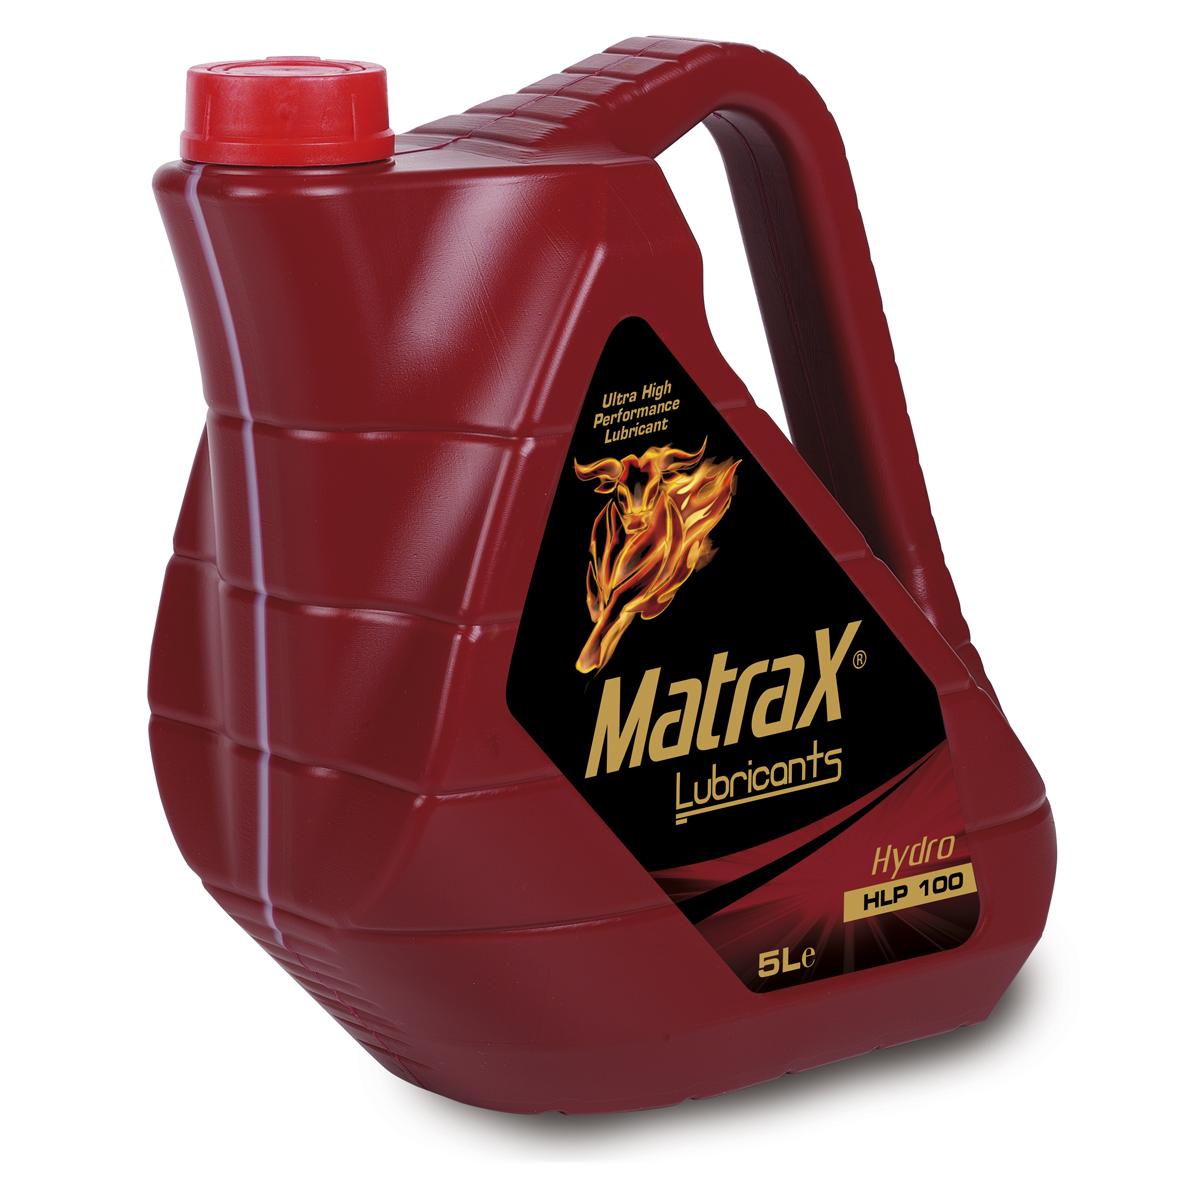 MatraX Hydro HLP 100